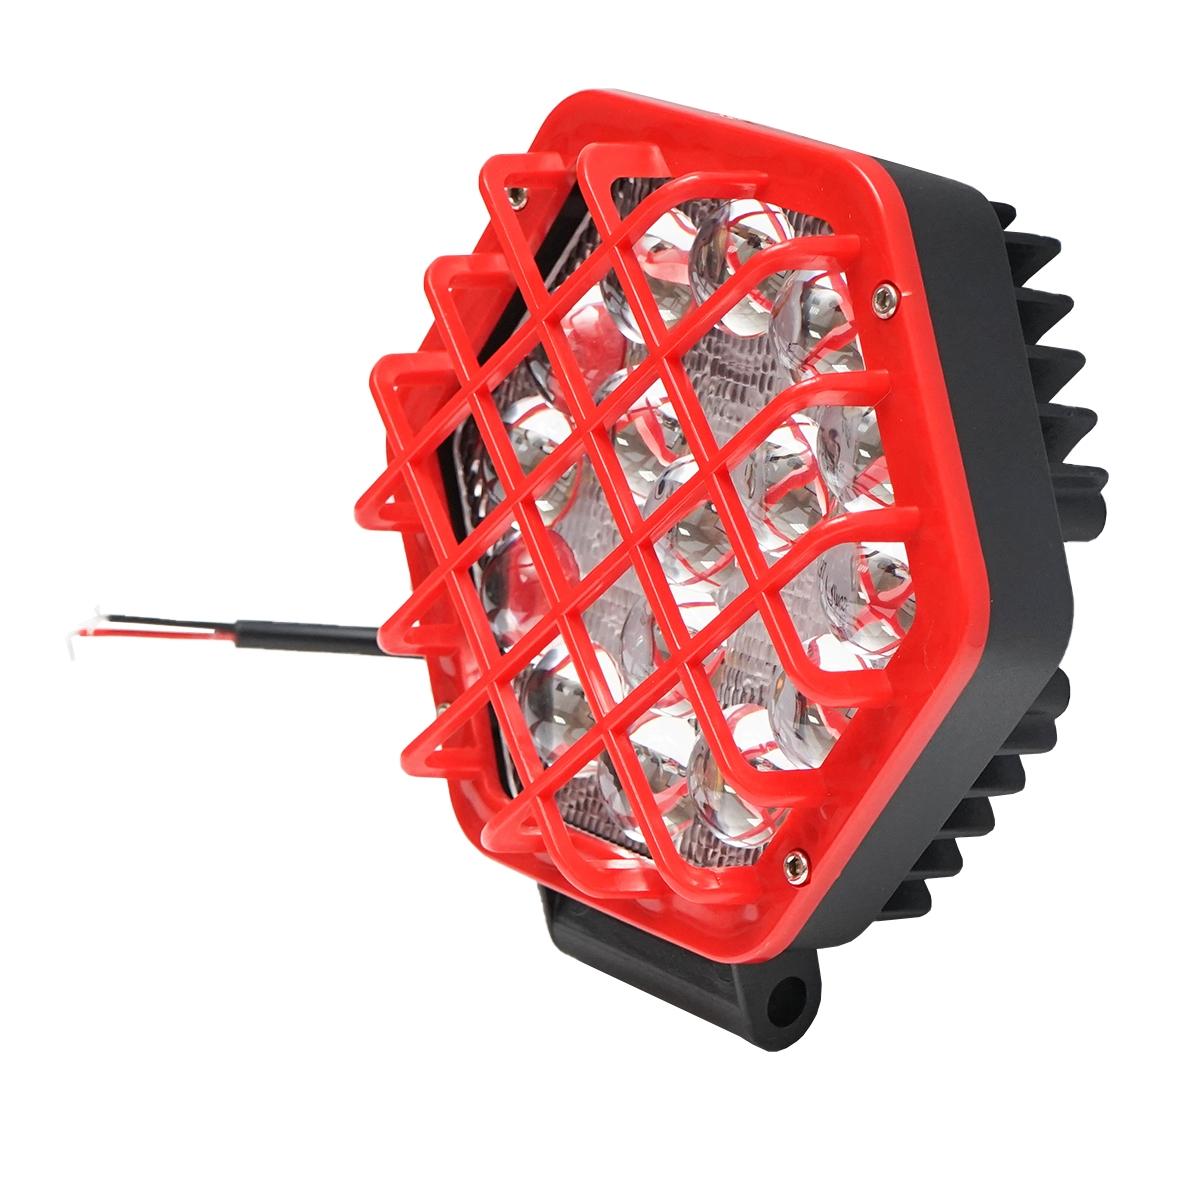 Lampa proiector cu grilaj metalic rosu tip spot, 16 leduri, DC 10-80V 48W unghi de radiere 30 grade